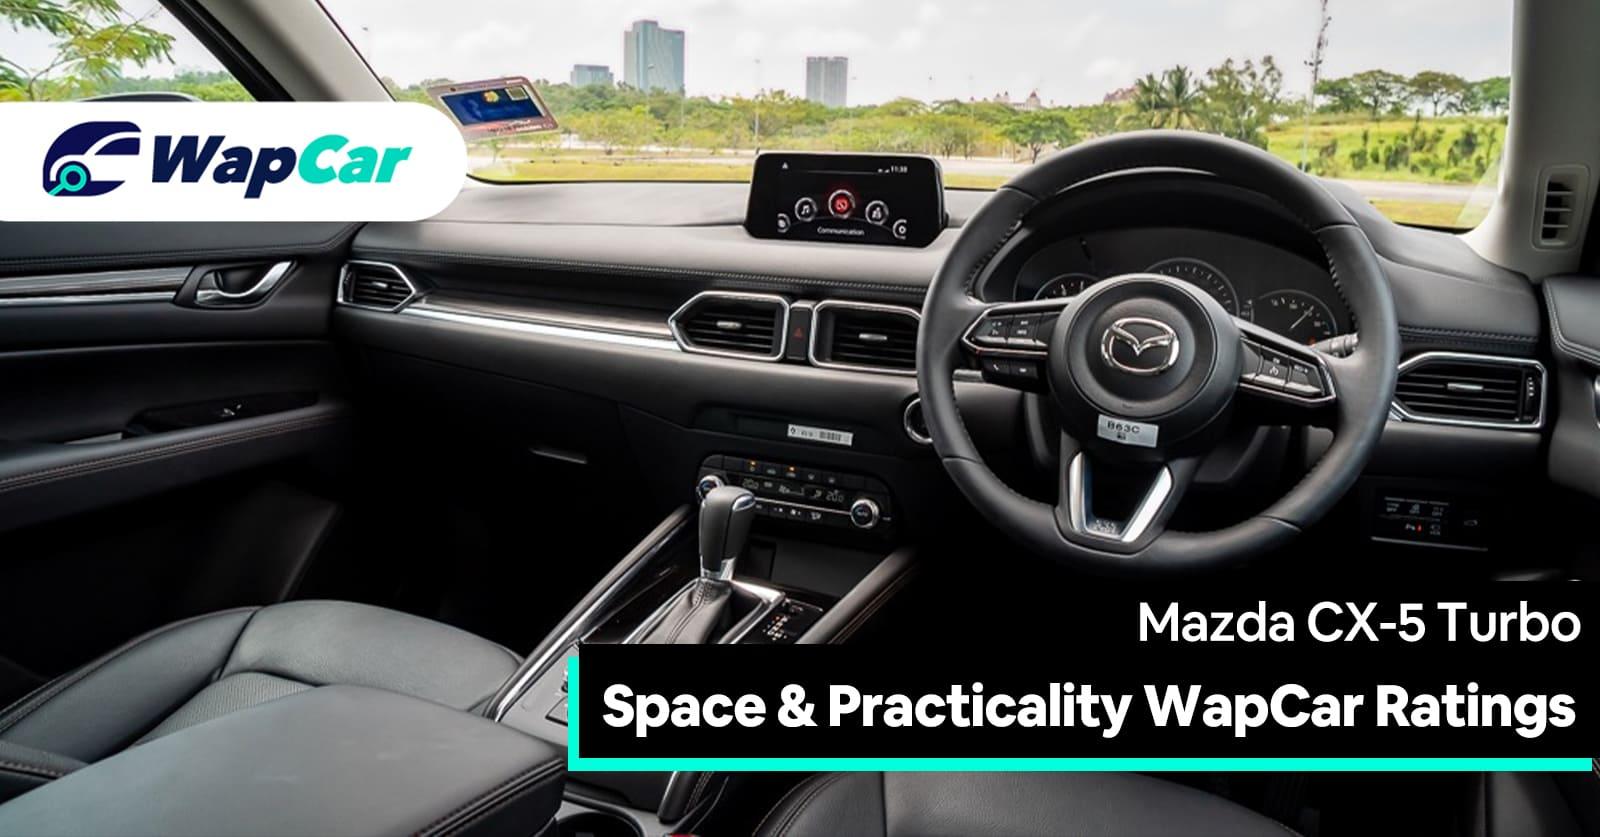 2020 Mazda CX-5 Space Ratings